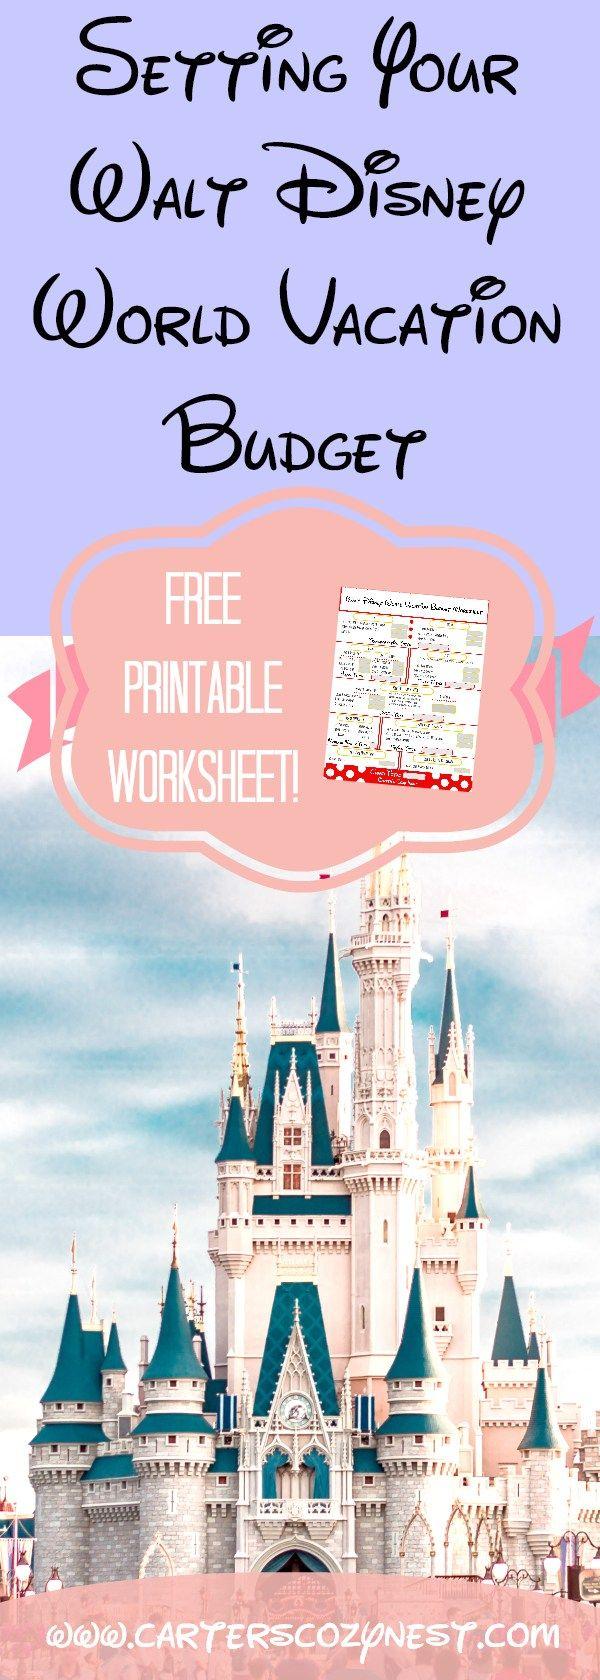 Walt Disney World Vacation Budget Worksheet